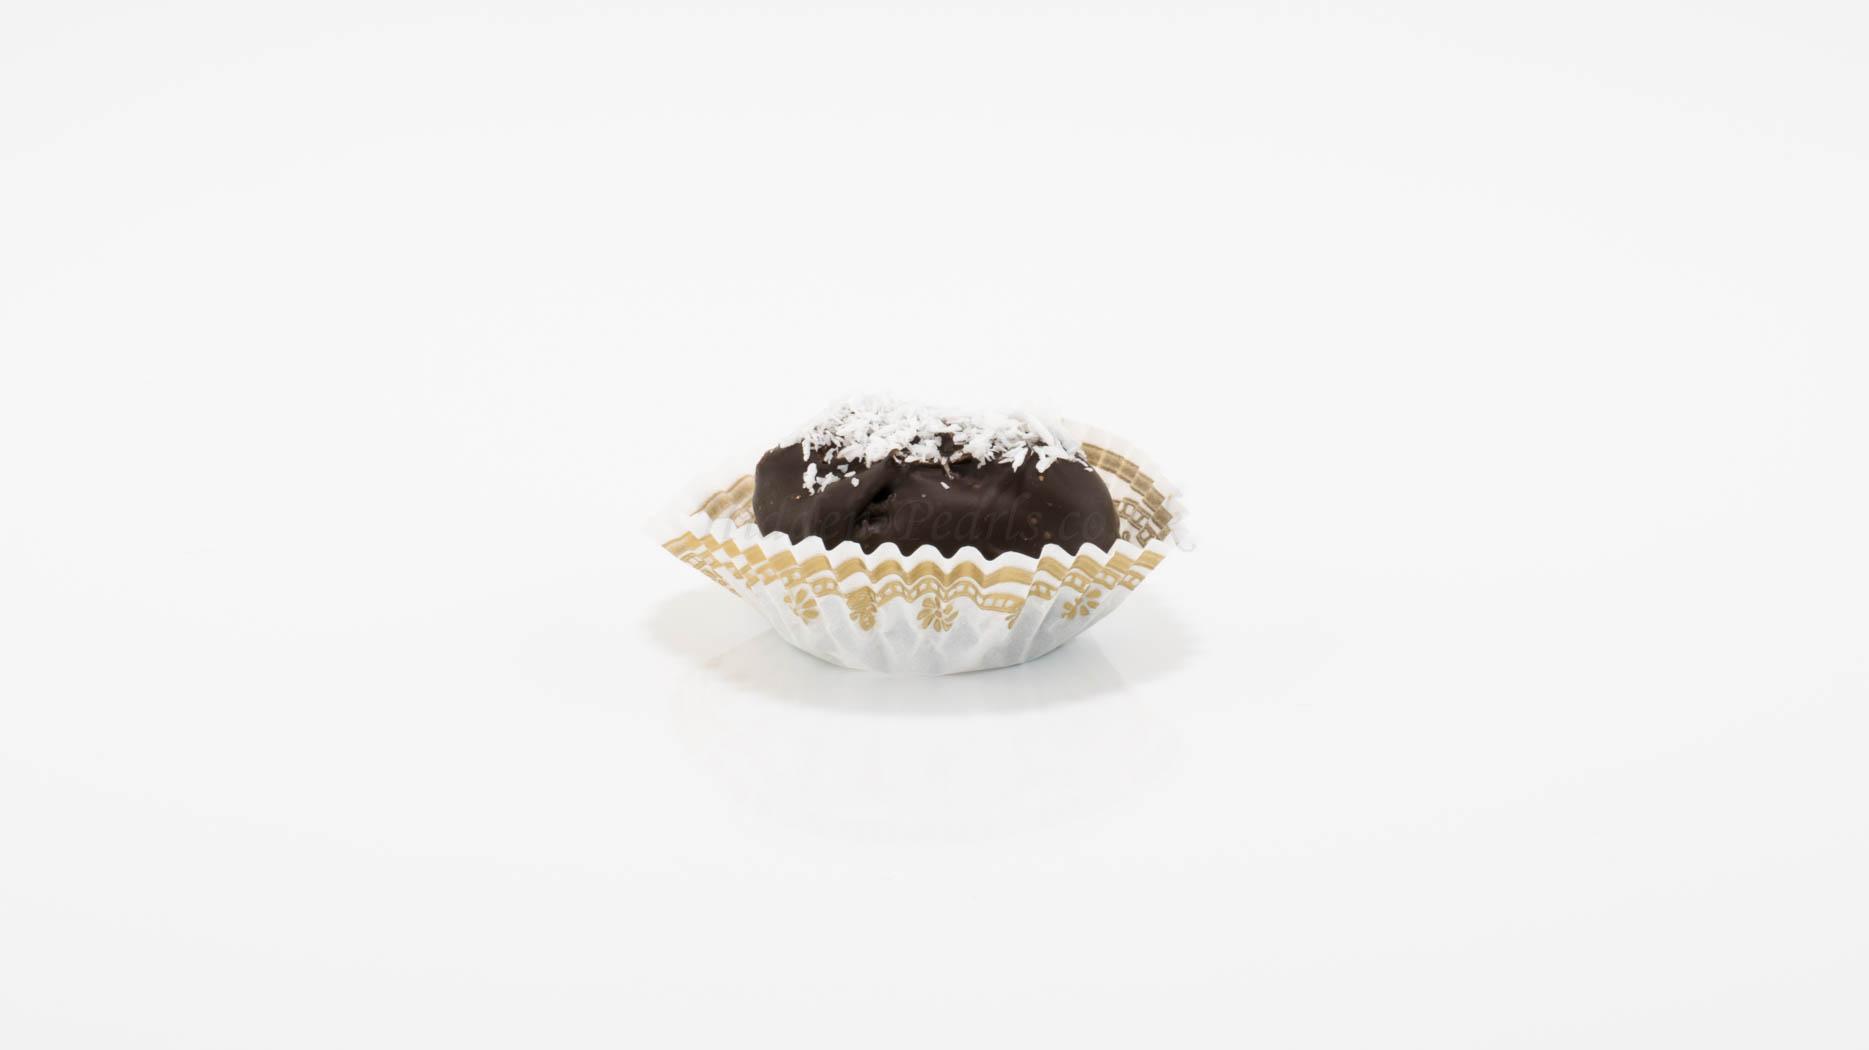 Coconut Dark Chocolate Date